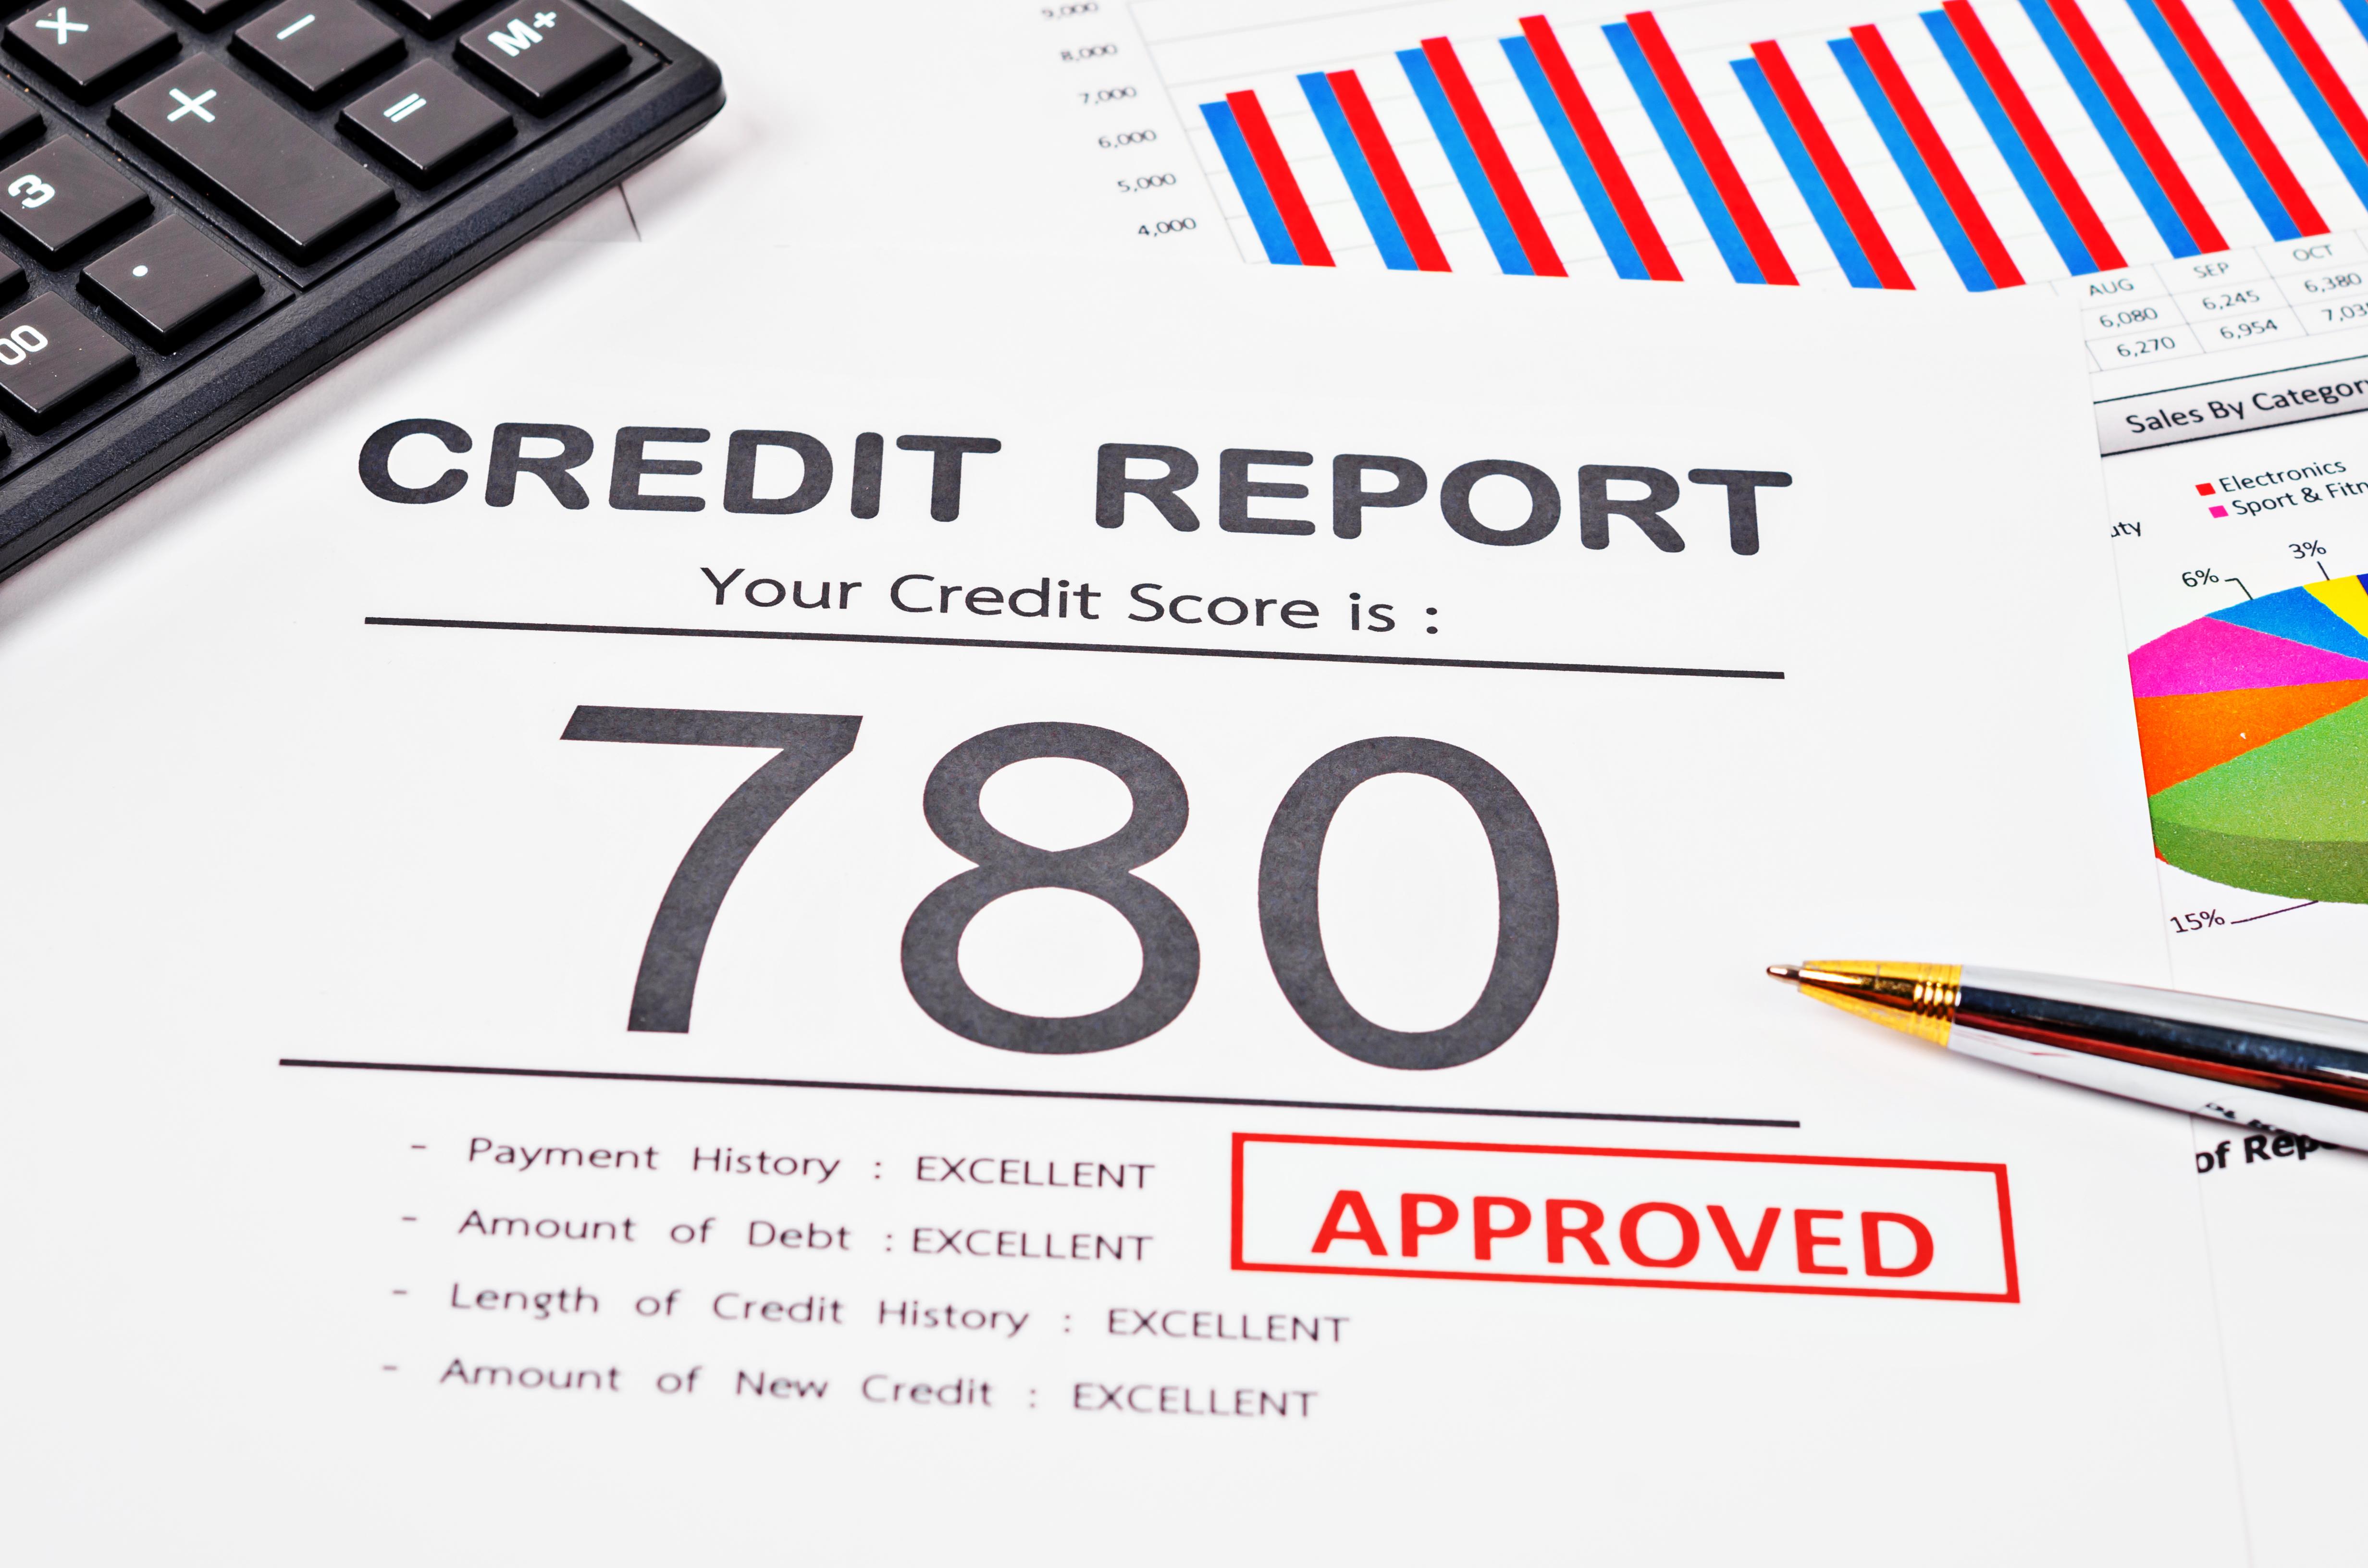 5 sneaky ways to improve your credit score - Clark Howard